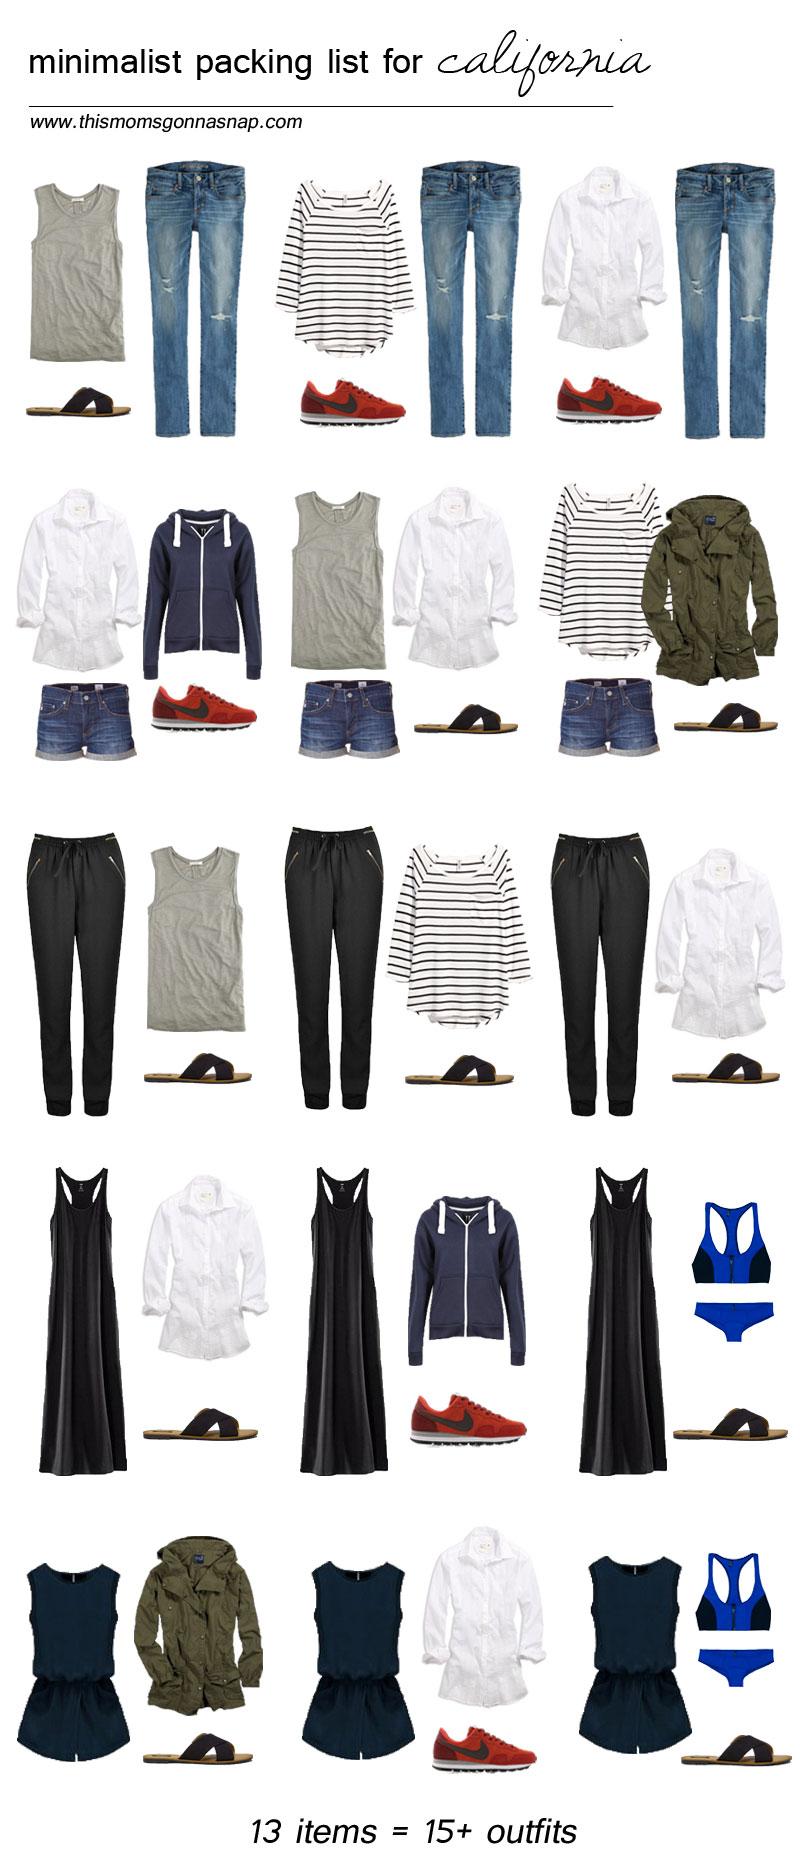 Mom Style, Packing List, Minimalist Wardrobe, Packing Light, California  Trip, California